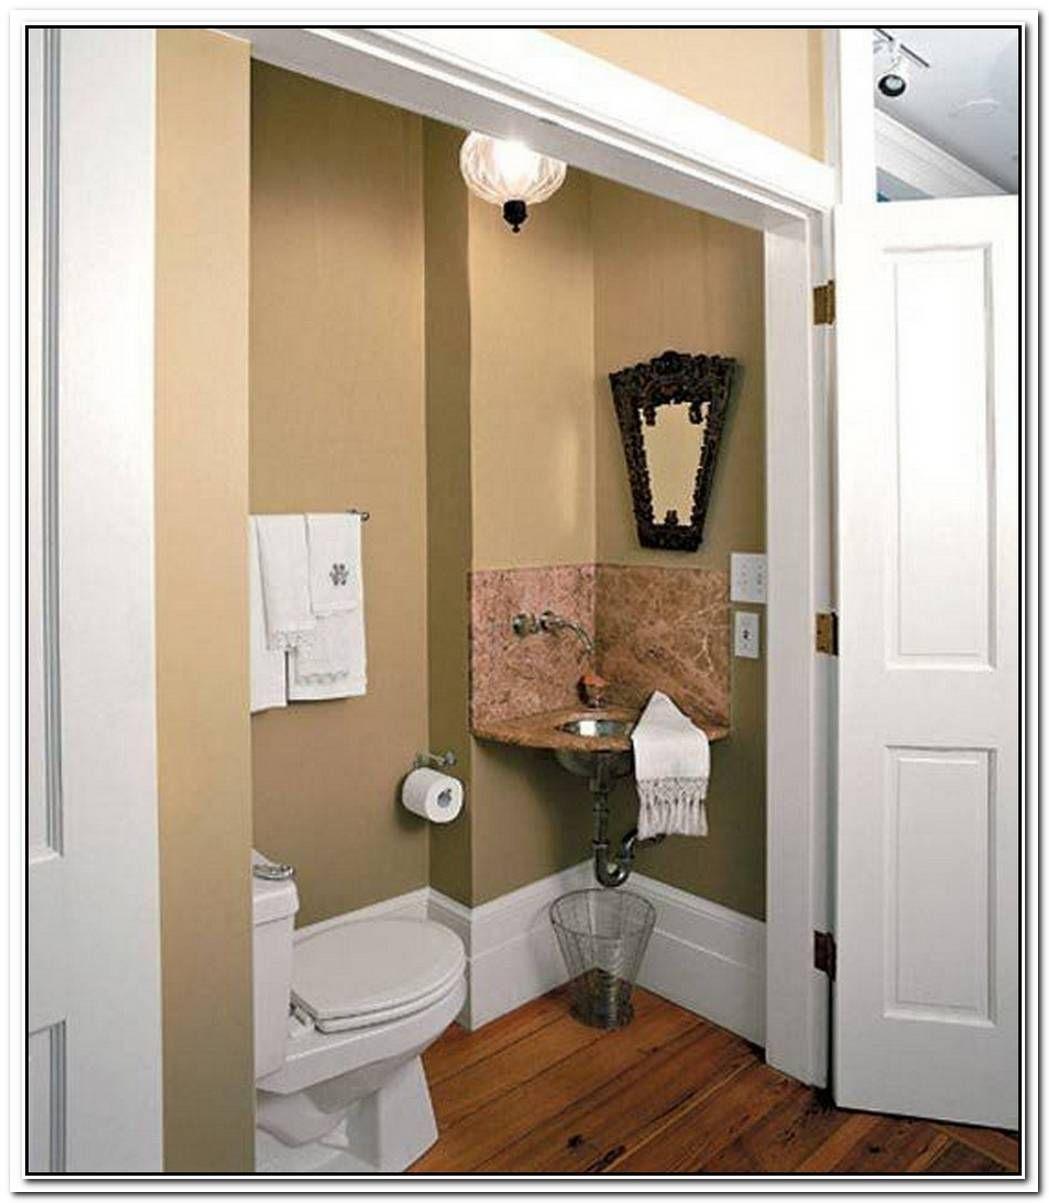 Closet Ideas Closet Bathroom Small With Images Simple Bathroom